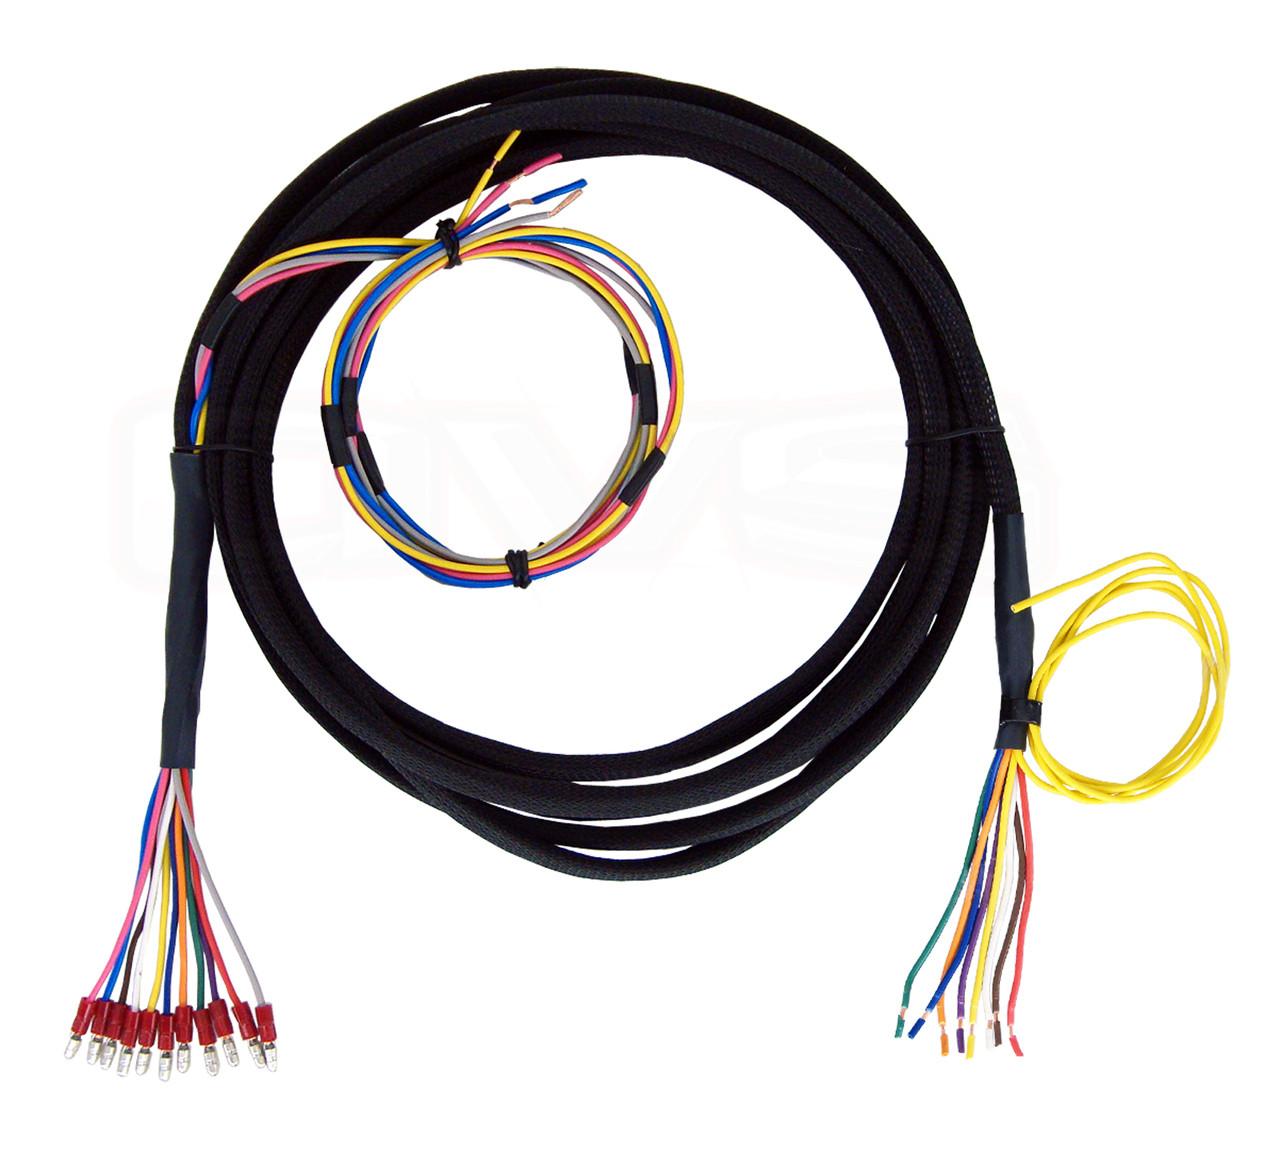 hight resolution of avs valve wiring harness 10 15 20 universal to avs 7 switch rh avsontheweb com 7 wire trailer wiring harness 4 plug wiring harness diagram